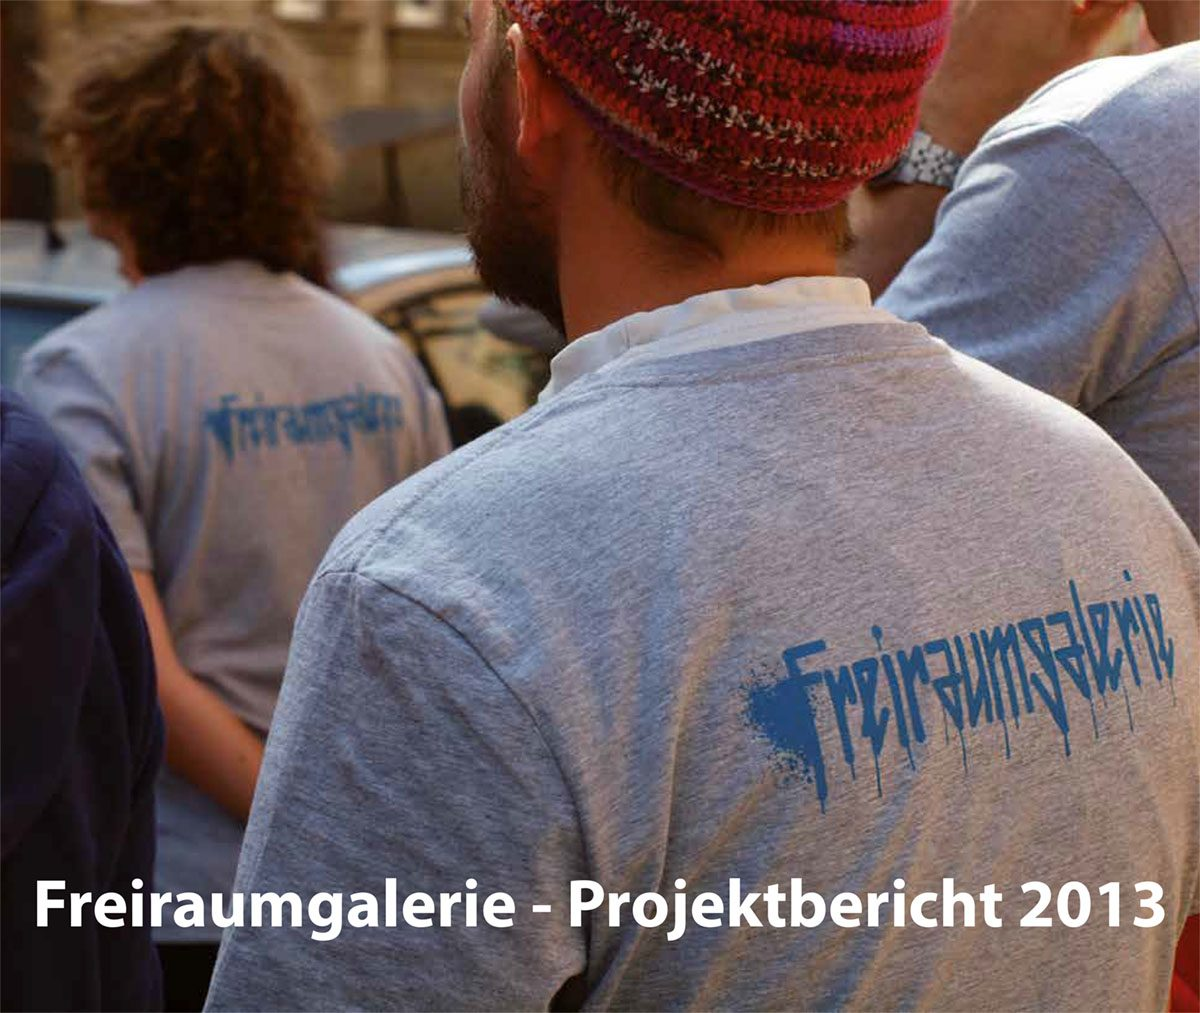 Projektbericht Freiraumgalerie 2013 Teaser 1200x1013